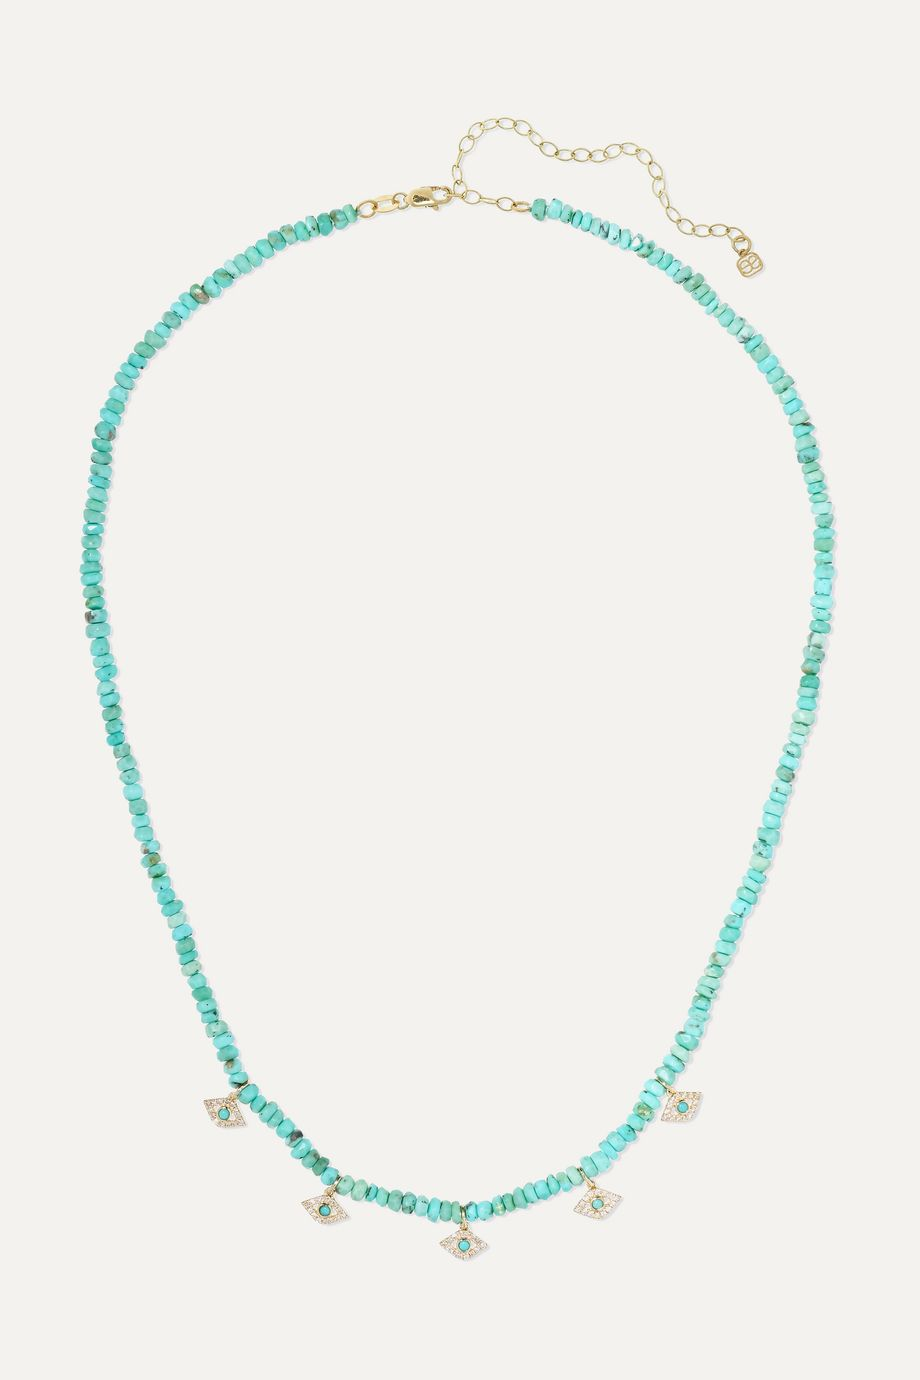 Sydney Evan Evil Eye 14-karat gold, diamond and turquoise necklace